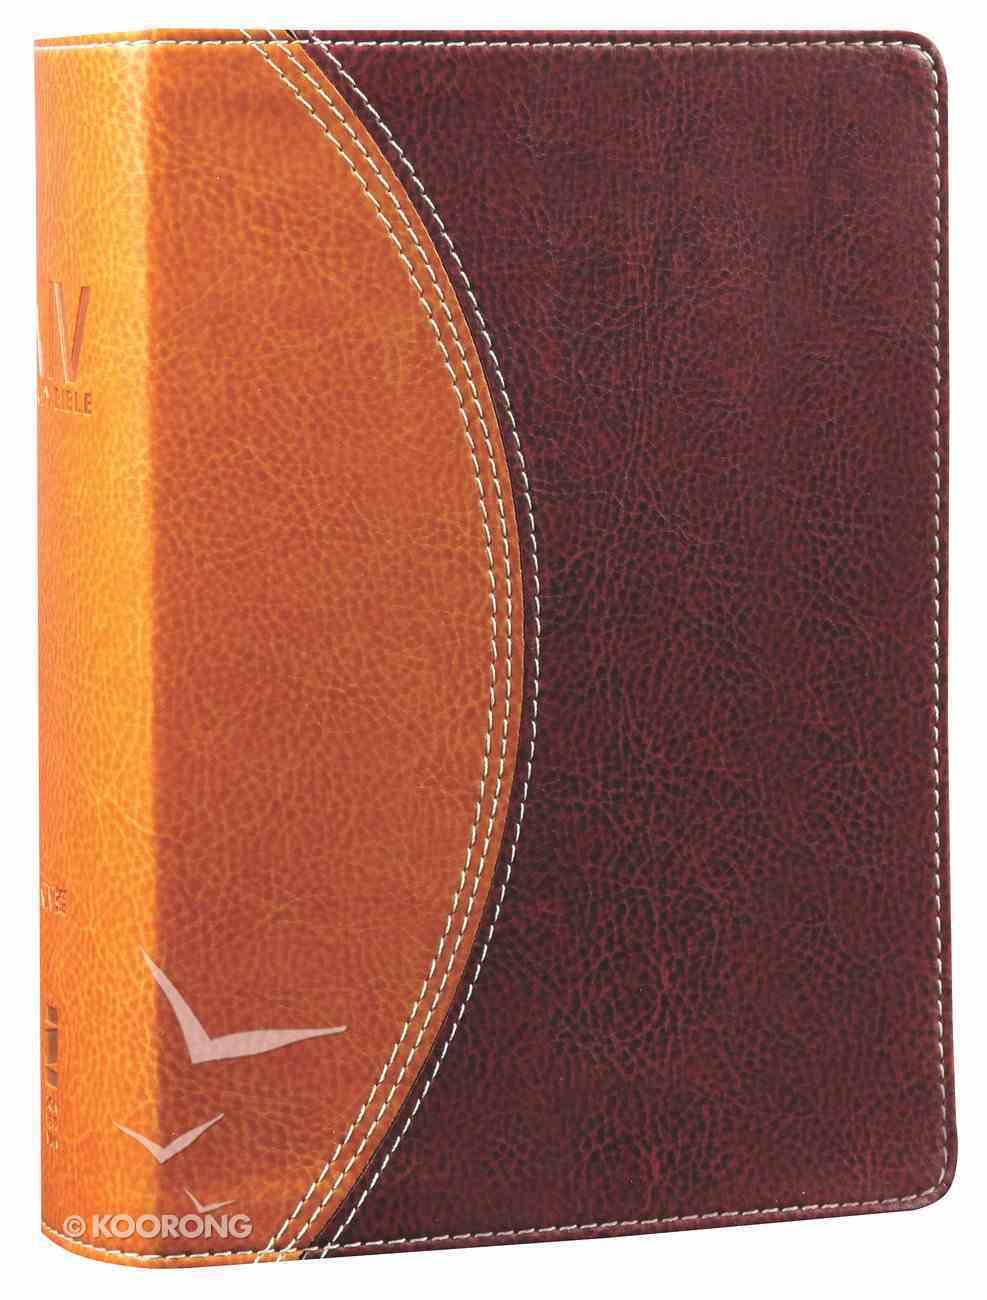 NIV Study Bible Compact Tan/Burgundy (Red Letter Edition) Premium Imitation Leather